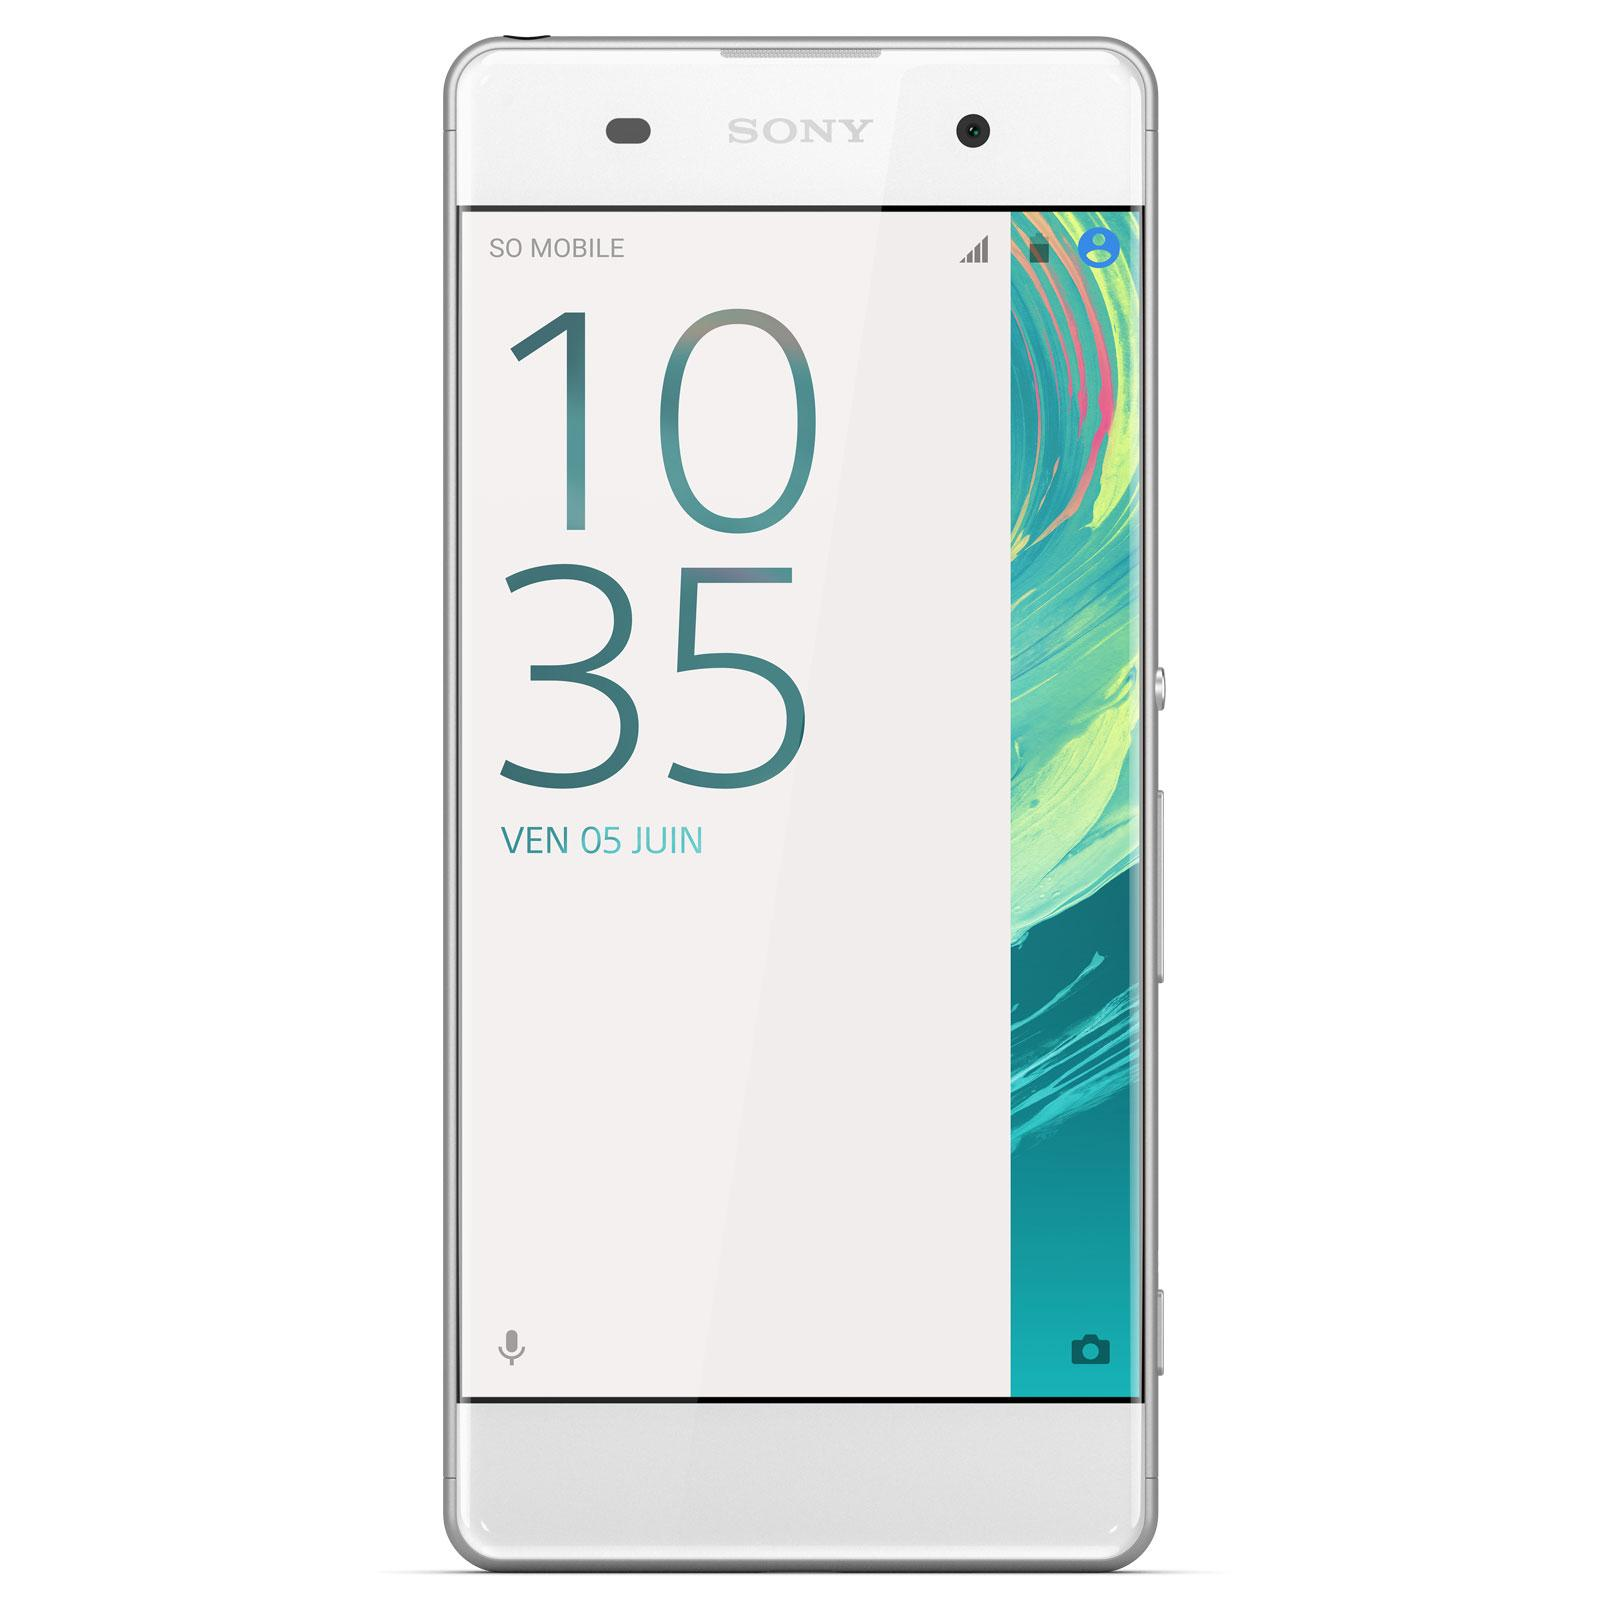 Sony Xperia XA - 16 Go - Blanc - Débloqué